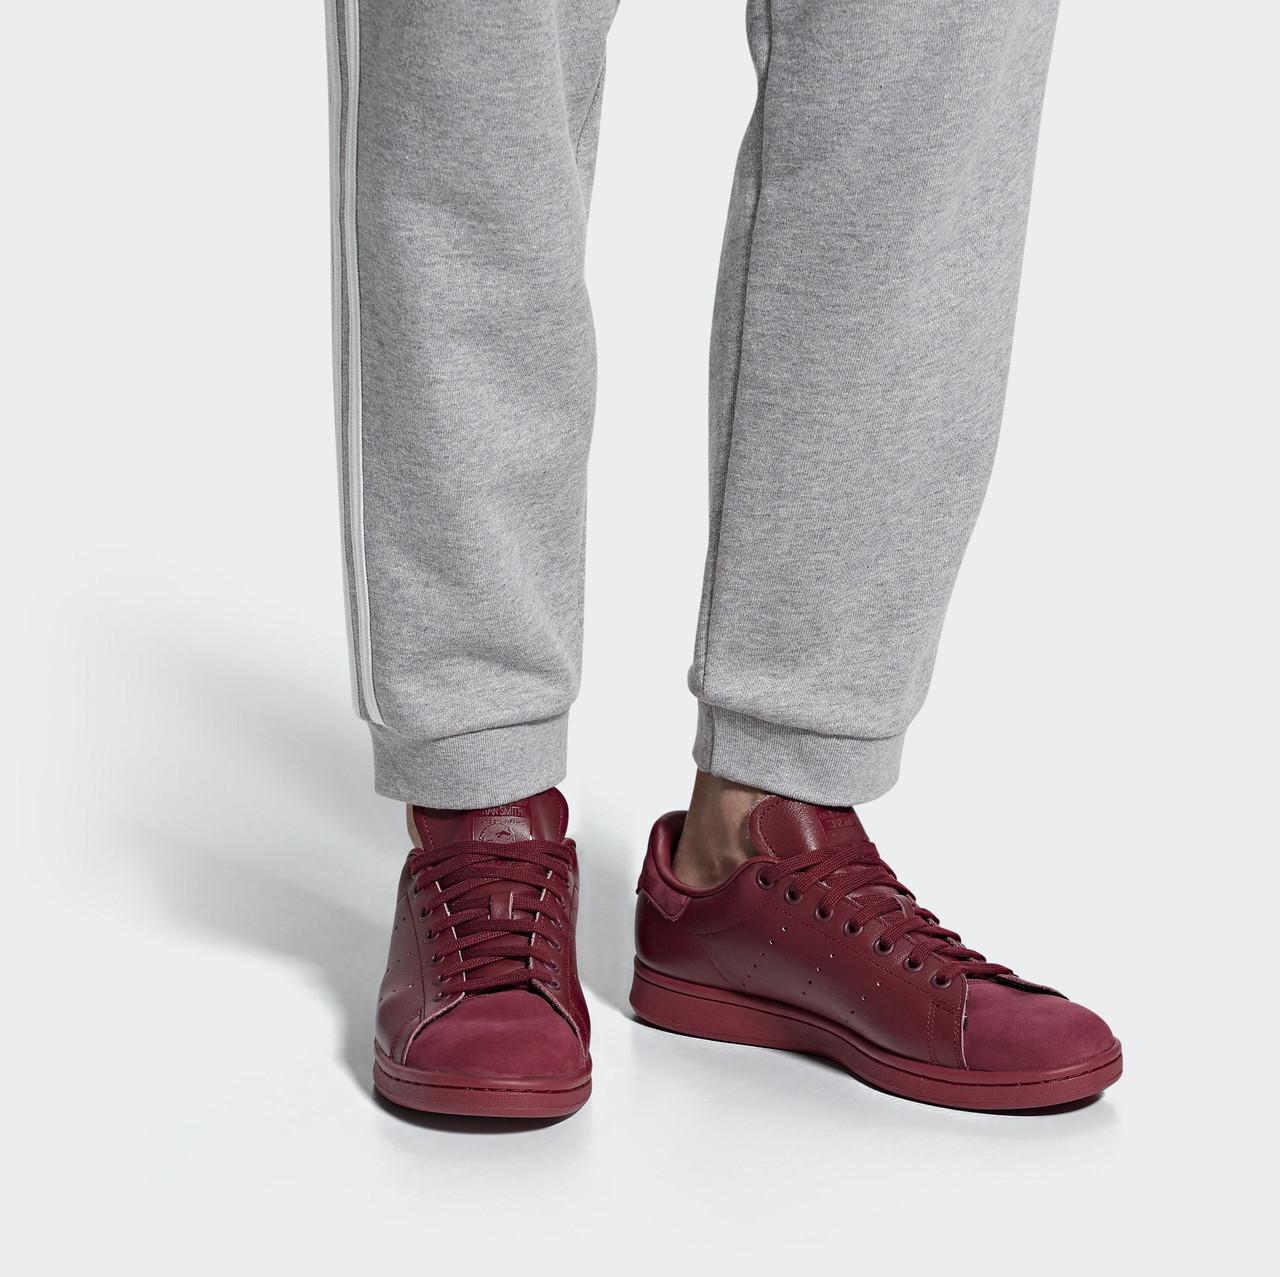 Кроссовки Adidas Stan Smith US 9.5